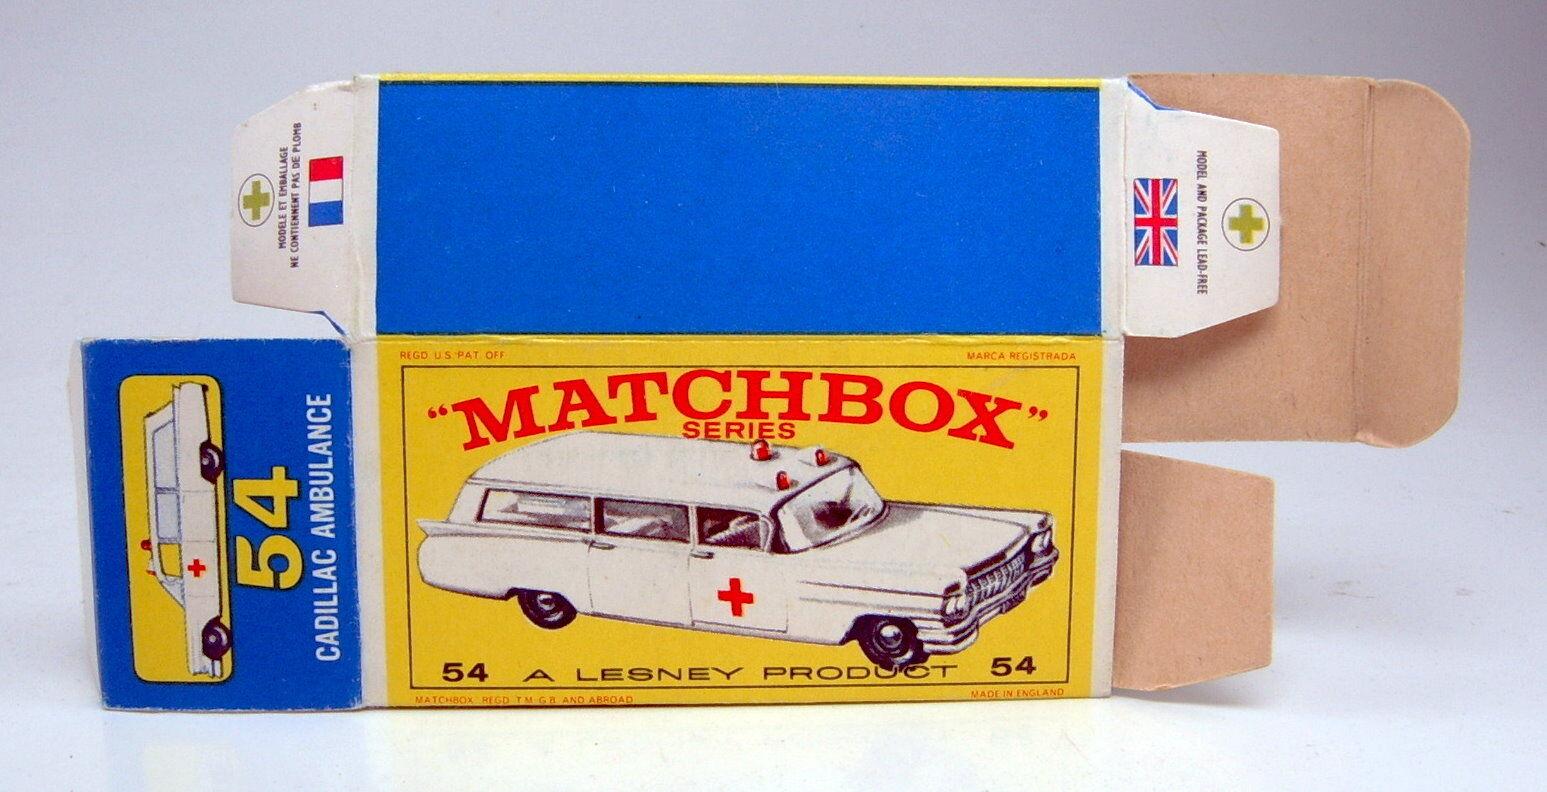 Matchbox Rw 54b Cadillac Ambulance empty original  e2  Box Top